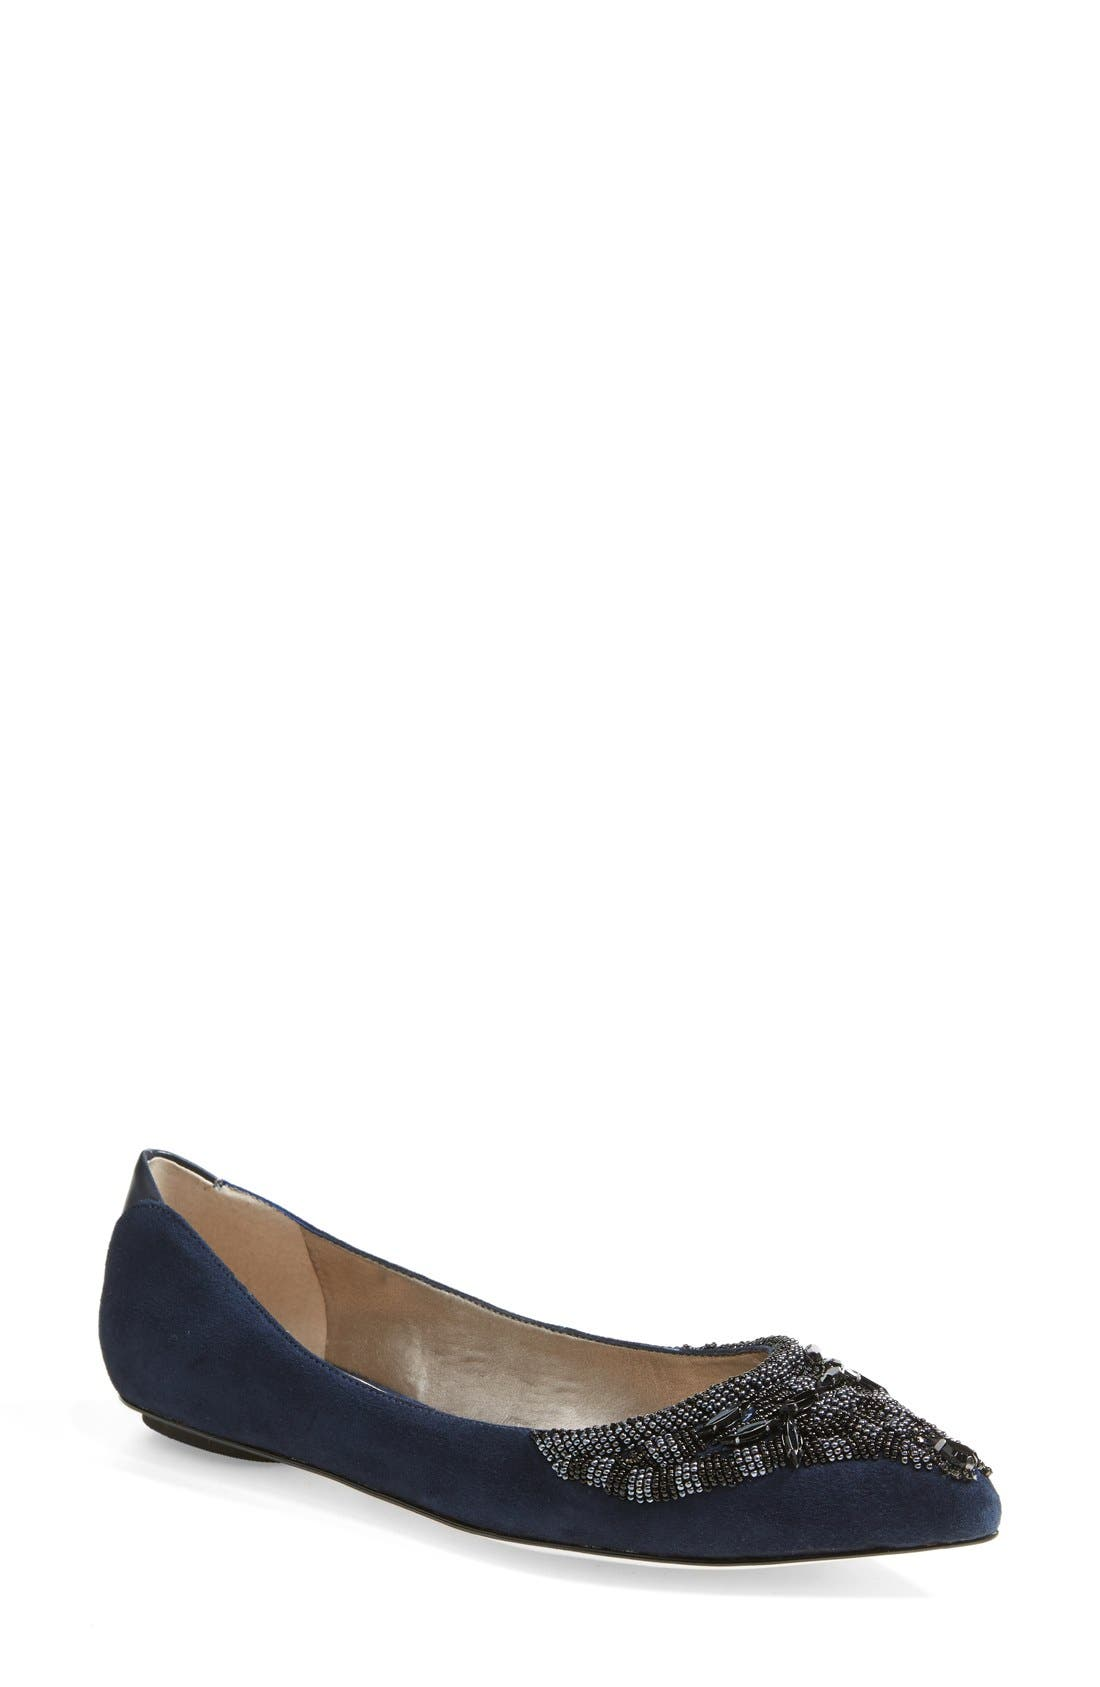 Main Image - Sam Edelman 'Cindi' Beaded Pointy Toe Flat (Women)